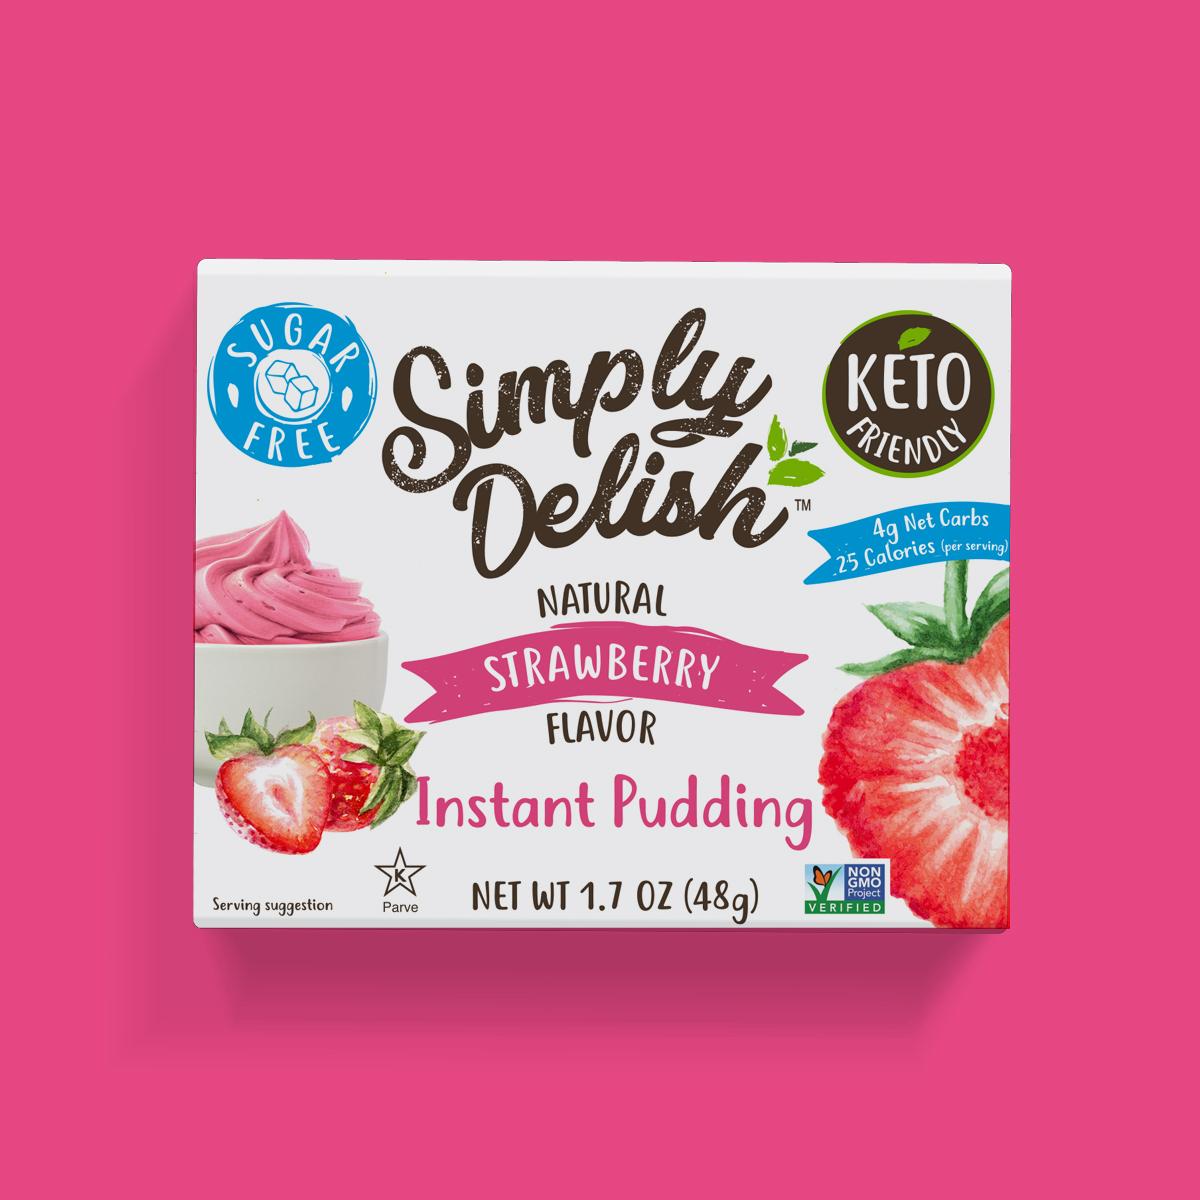 Simply Delish Keto Friendly vegan Strawberry Pudding